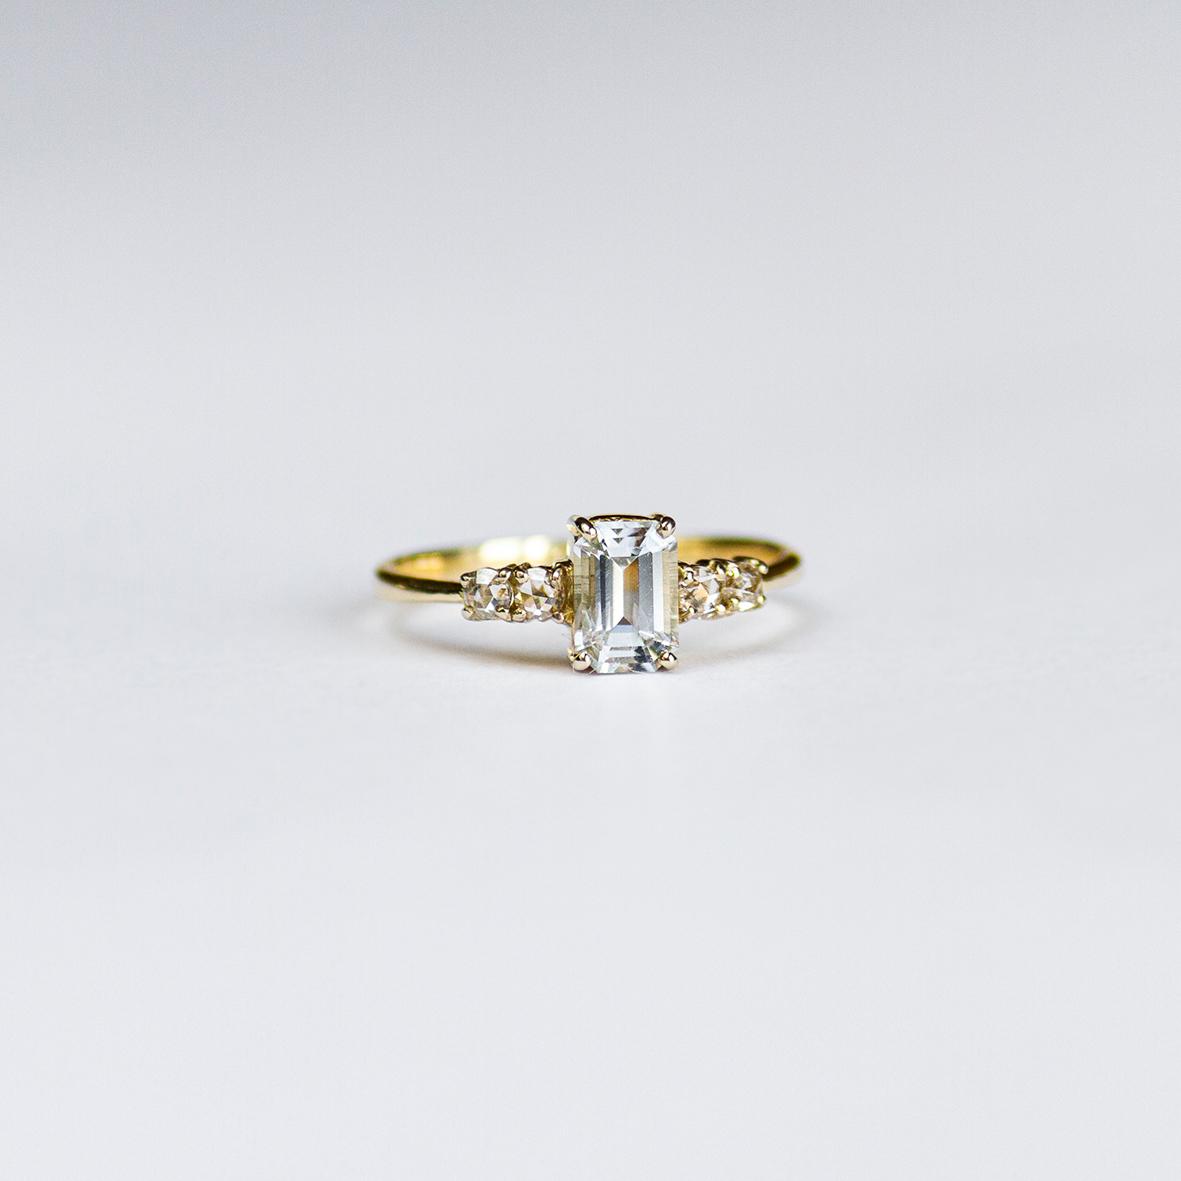 2. OONA_engagement_ficha1_single sapphire with diamonds ring